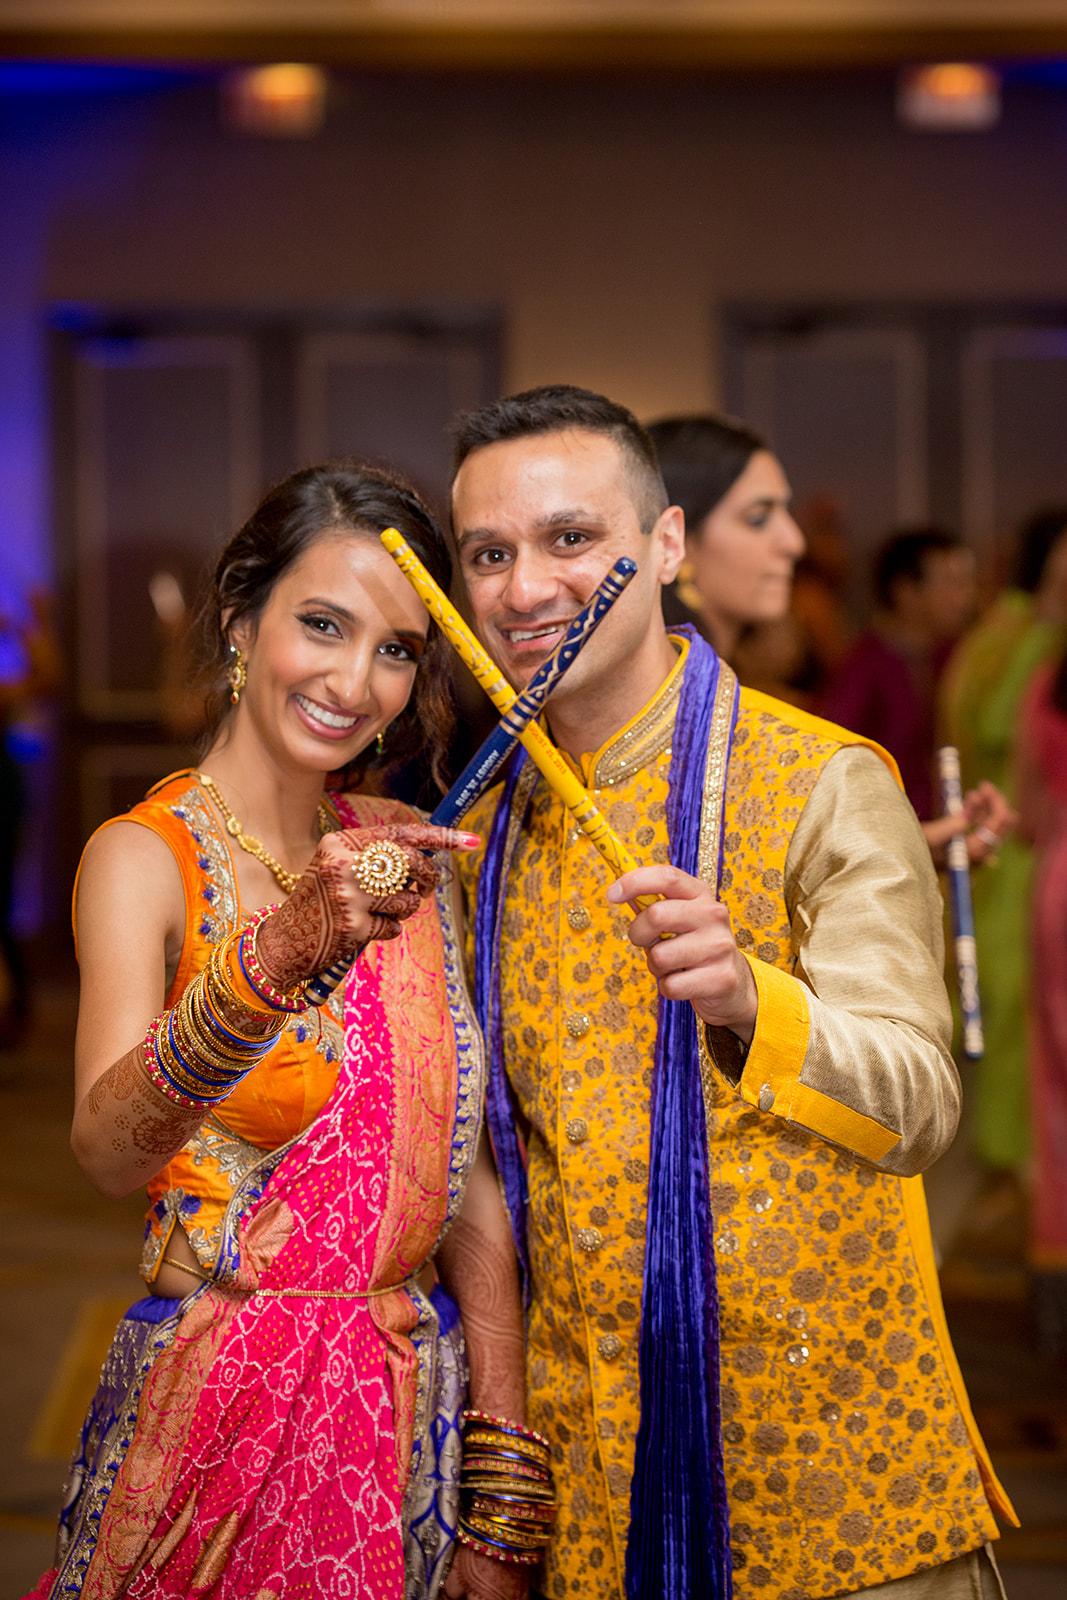 Le Cape Weddings - Monica and Pratik - Sangeet 00494.jpg